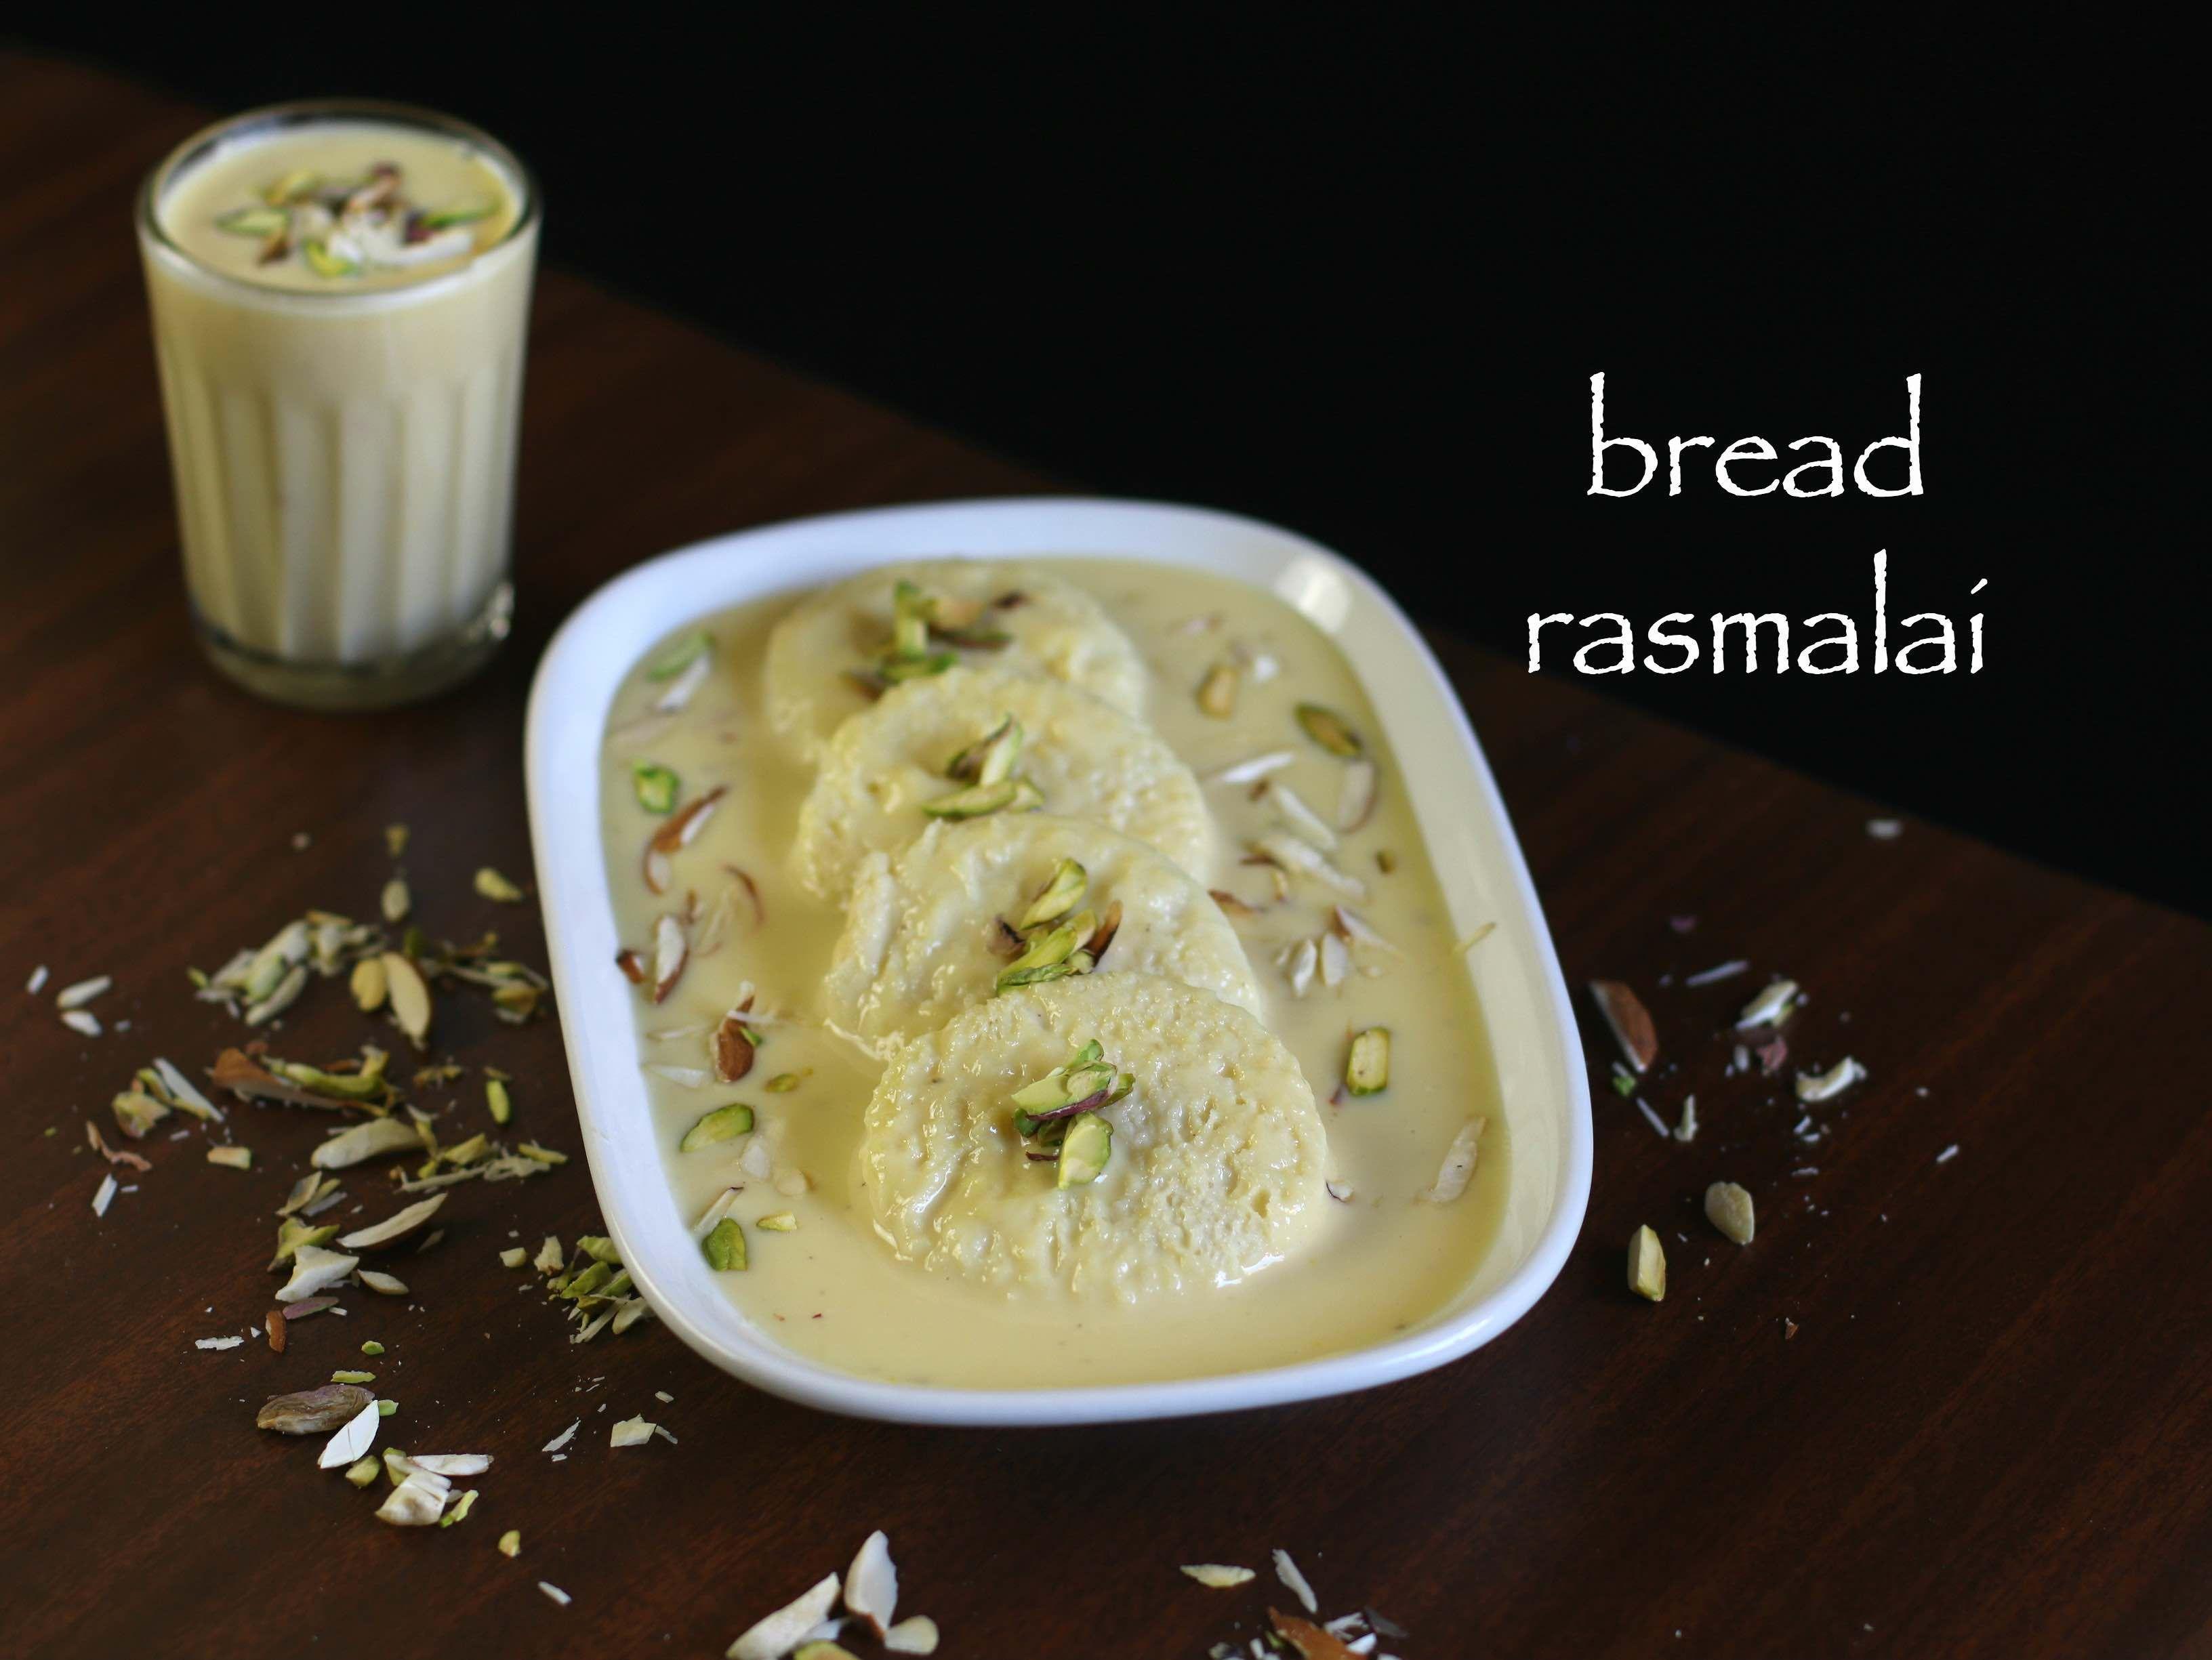 Bread Rasmalai Recipe Bread Ki Rasmalai With Milkmaid Instant Rasmalai Recipe Indian Food Recipes Recipes Breakfast Recipes Indian